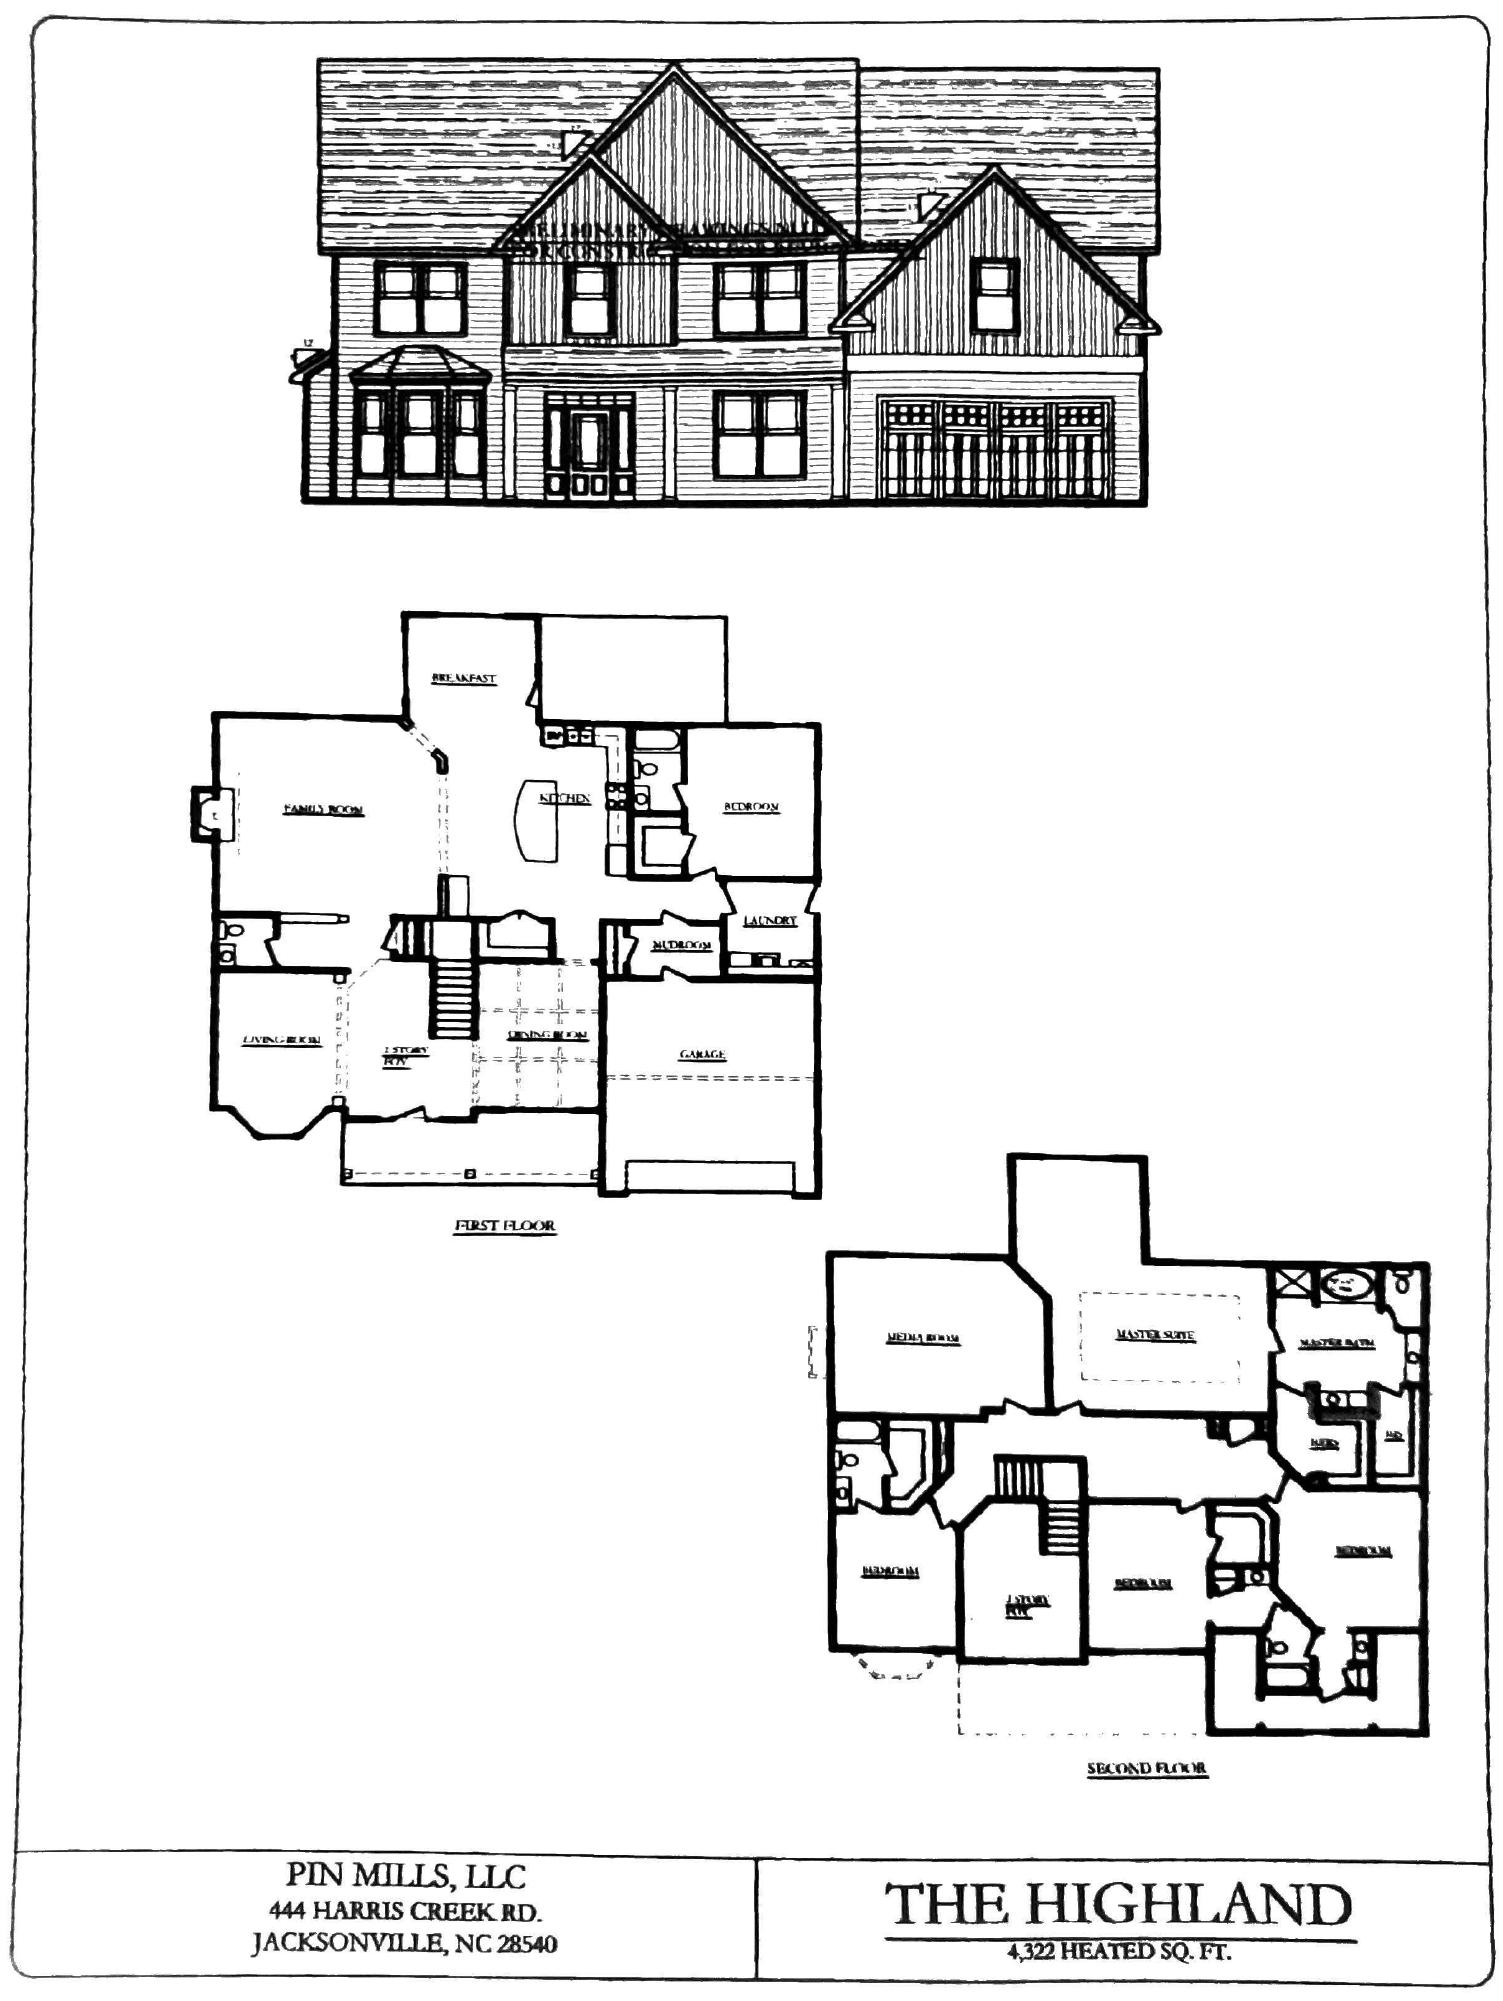 flooplan blueprints for the Southwest Plantation Highland home